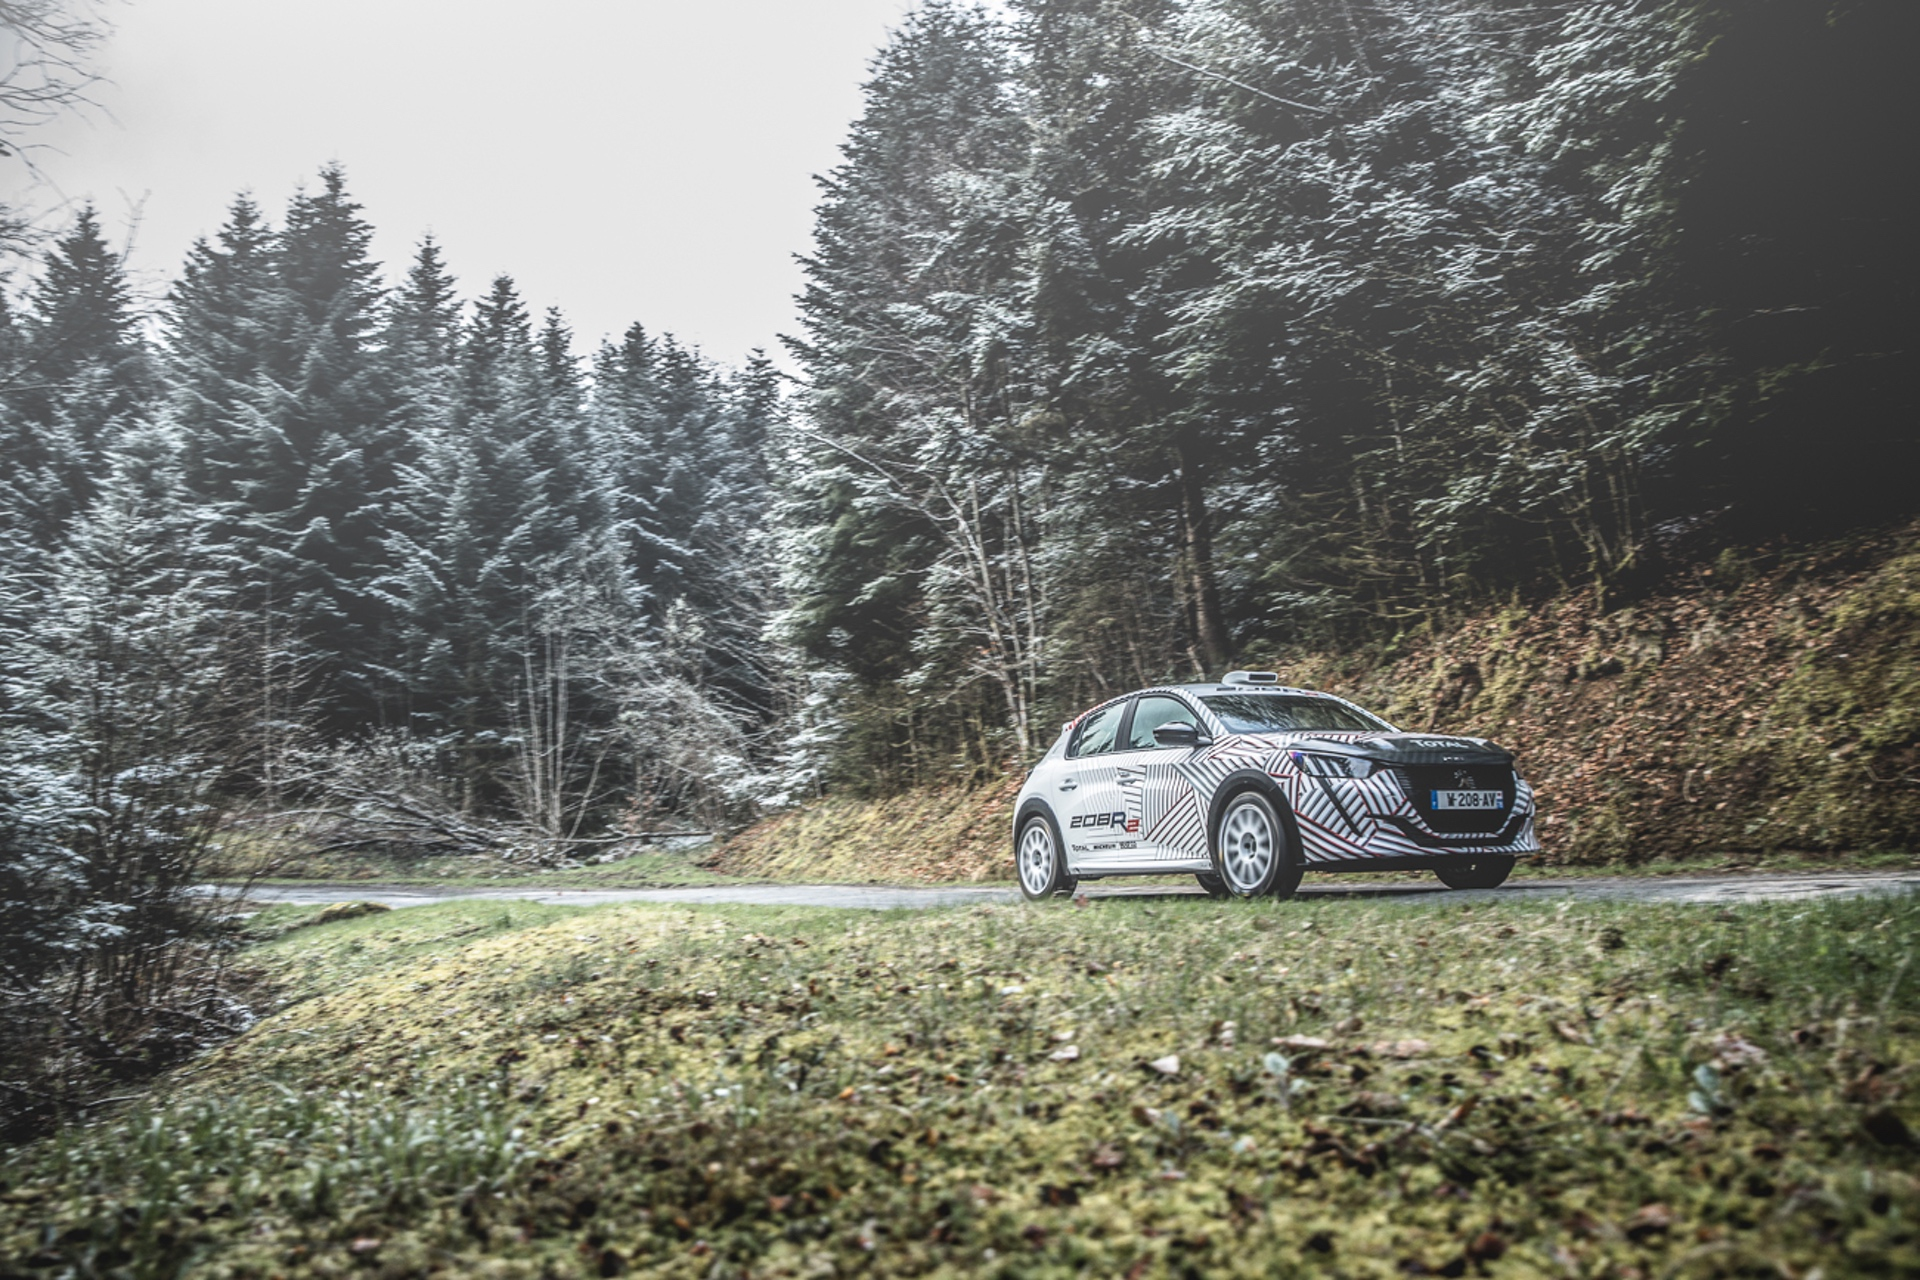 Peugeot_208_Rally_4_0012